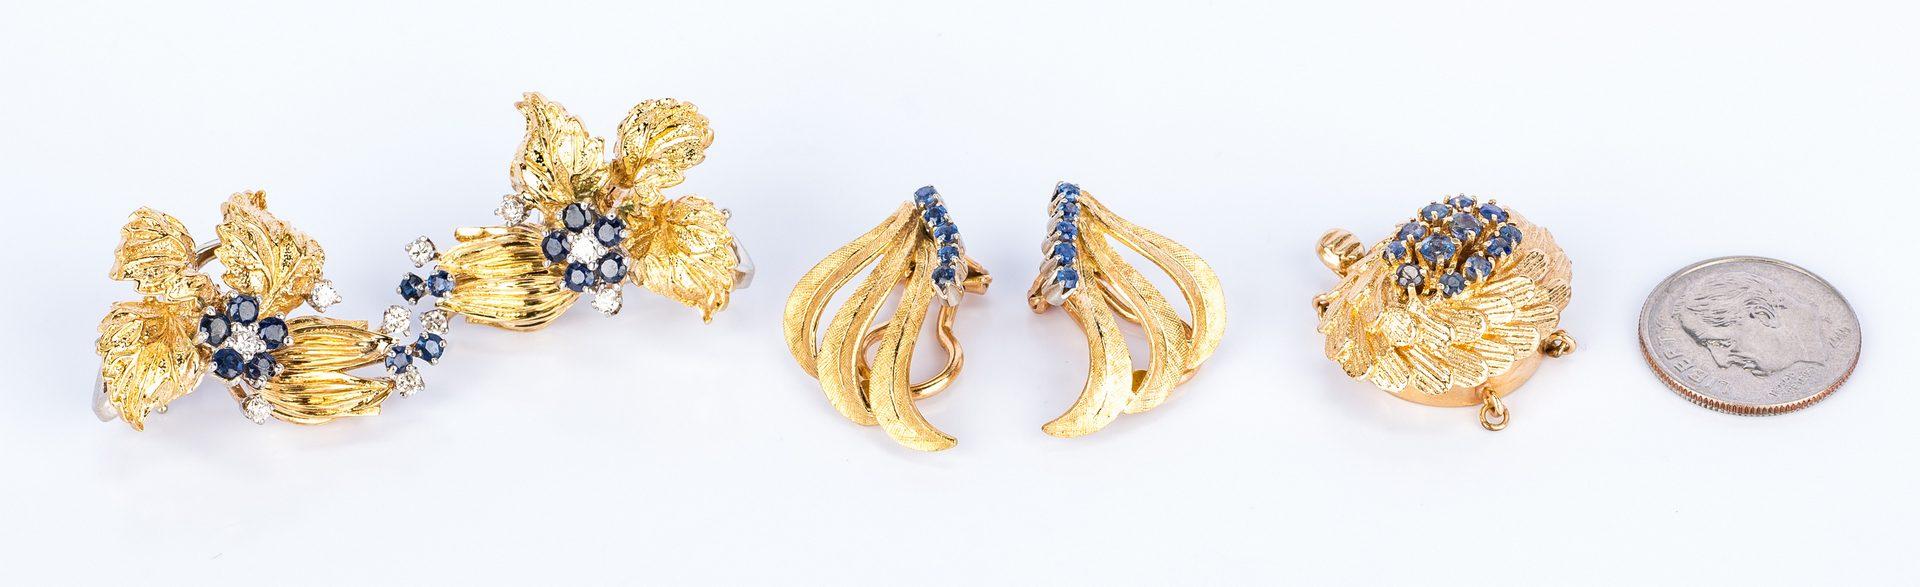 Lot 679: 18K/14K Sapphire Diamond Jewelry